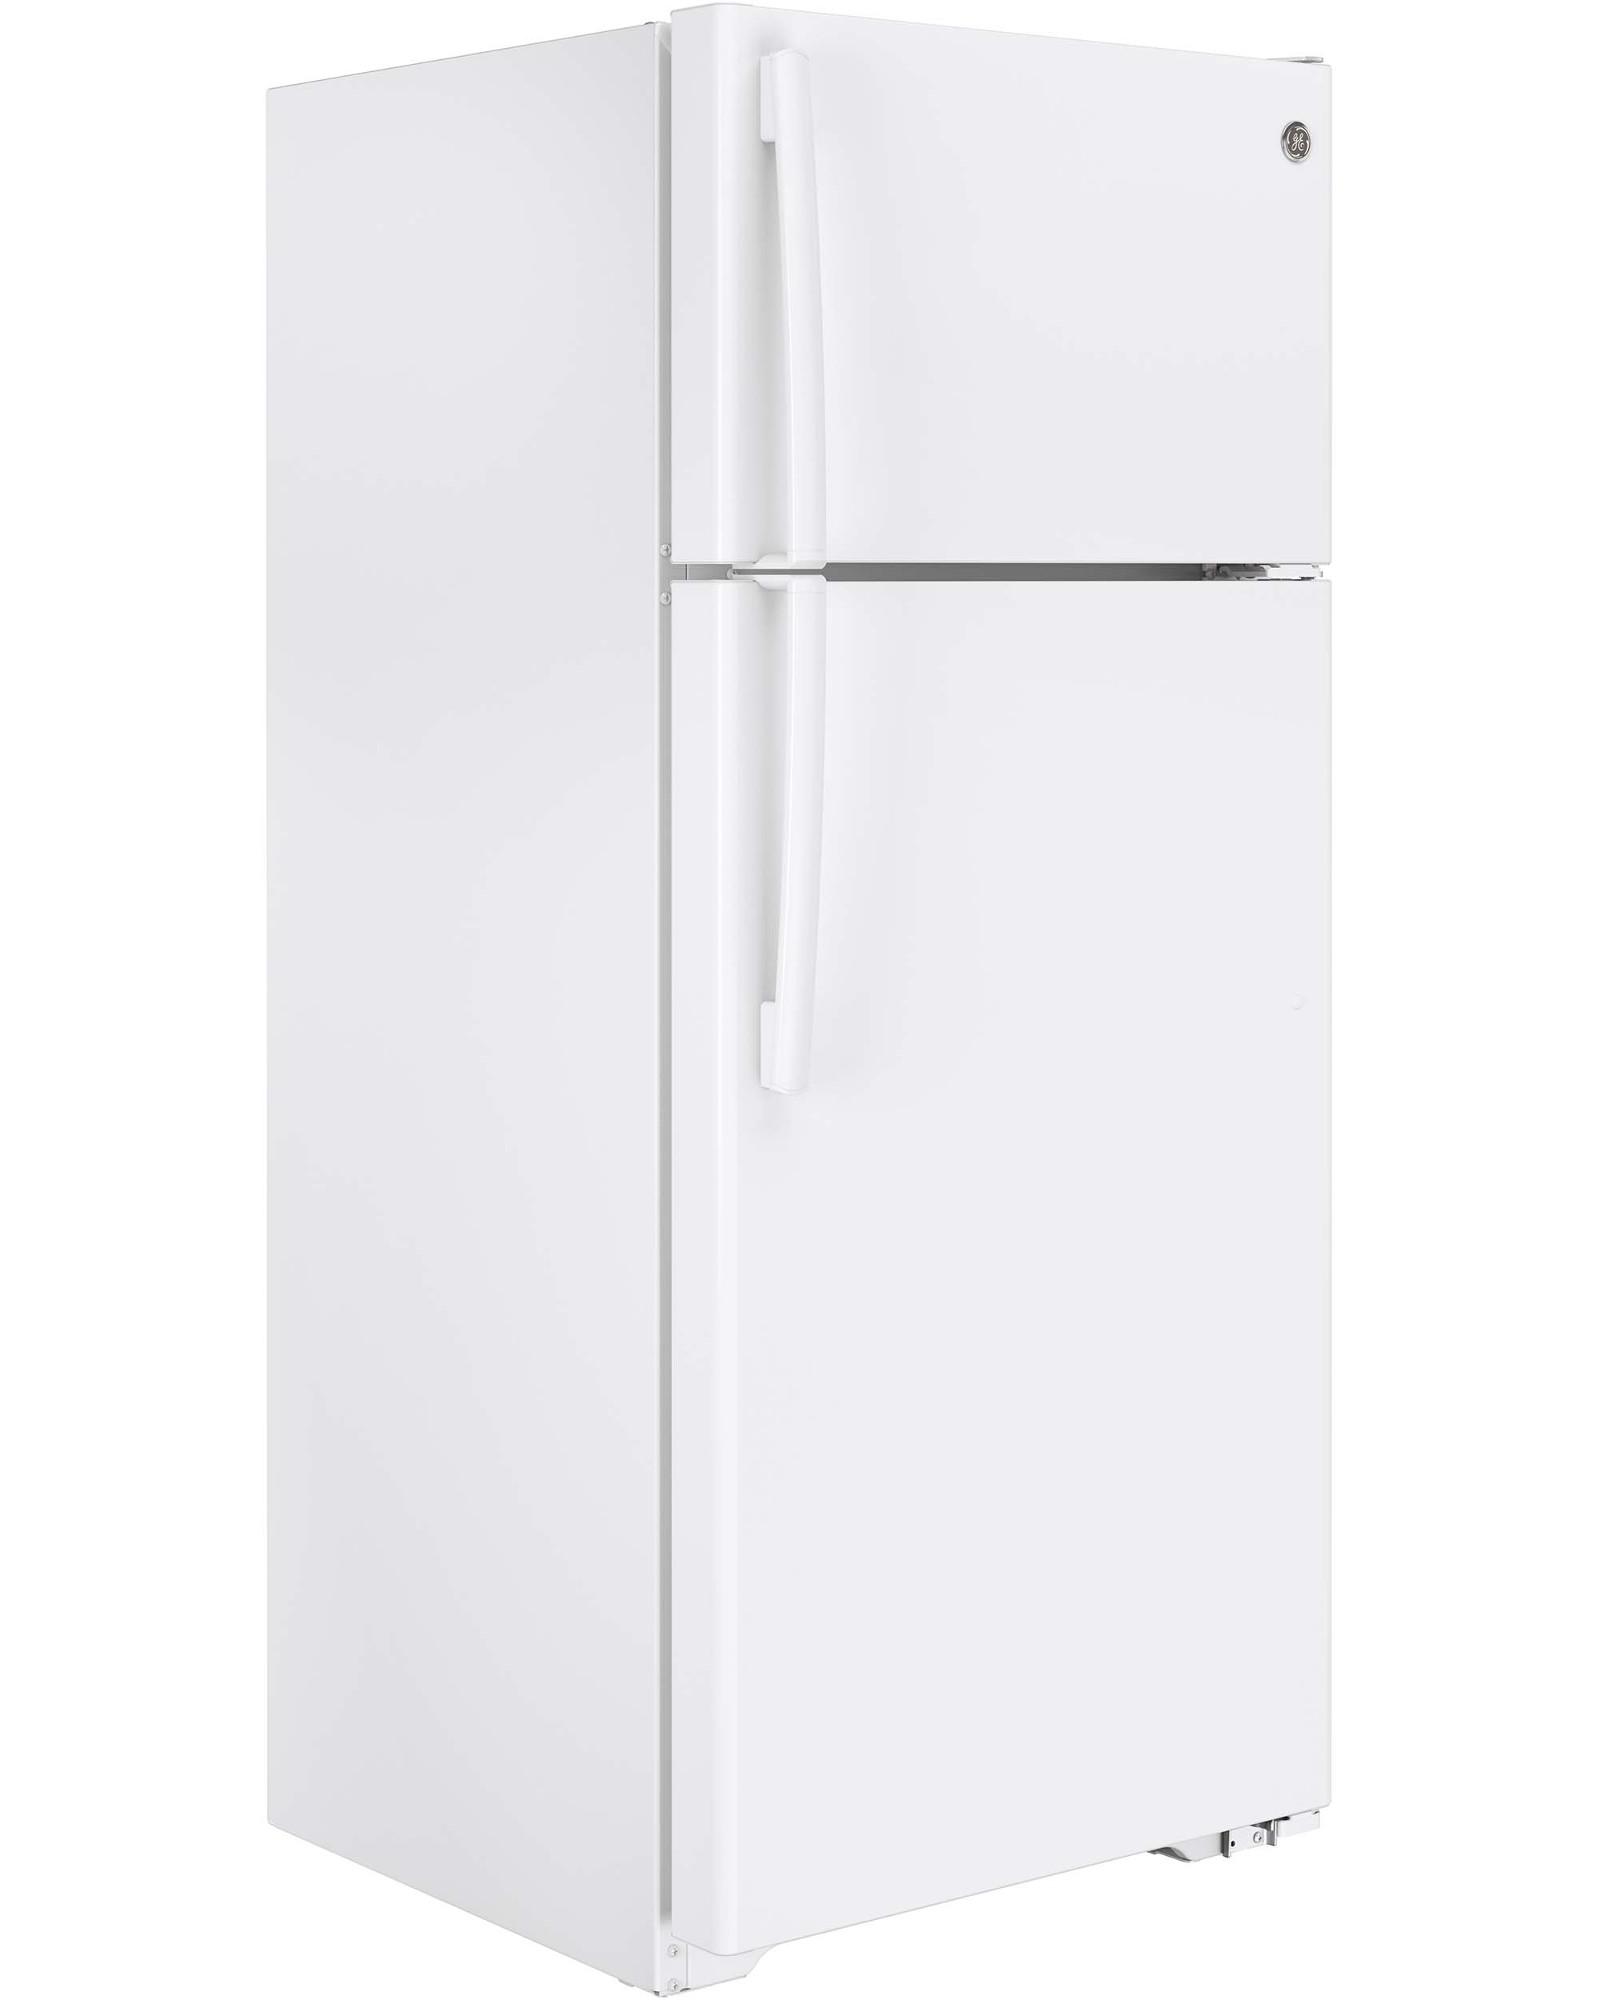 GE Appliances GTE18CTHWW 17.5 cu. ft. Top-Freezer Refrigerator - White